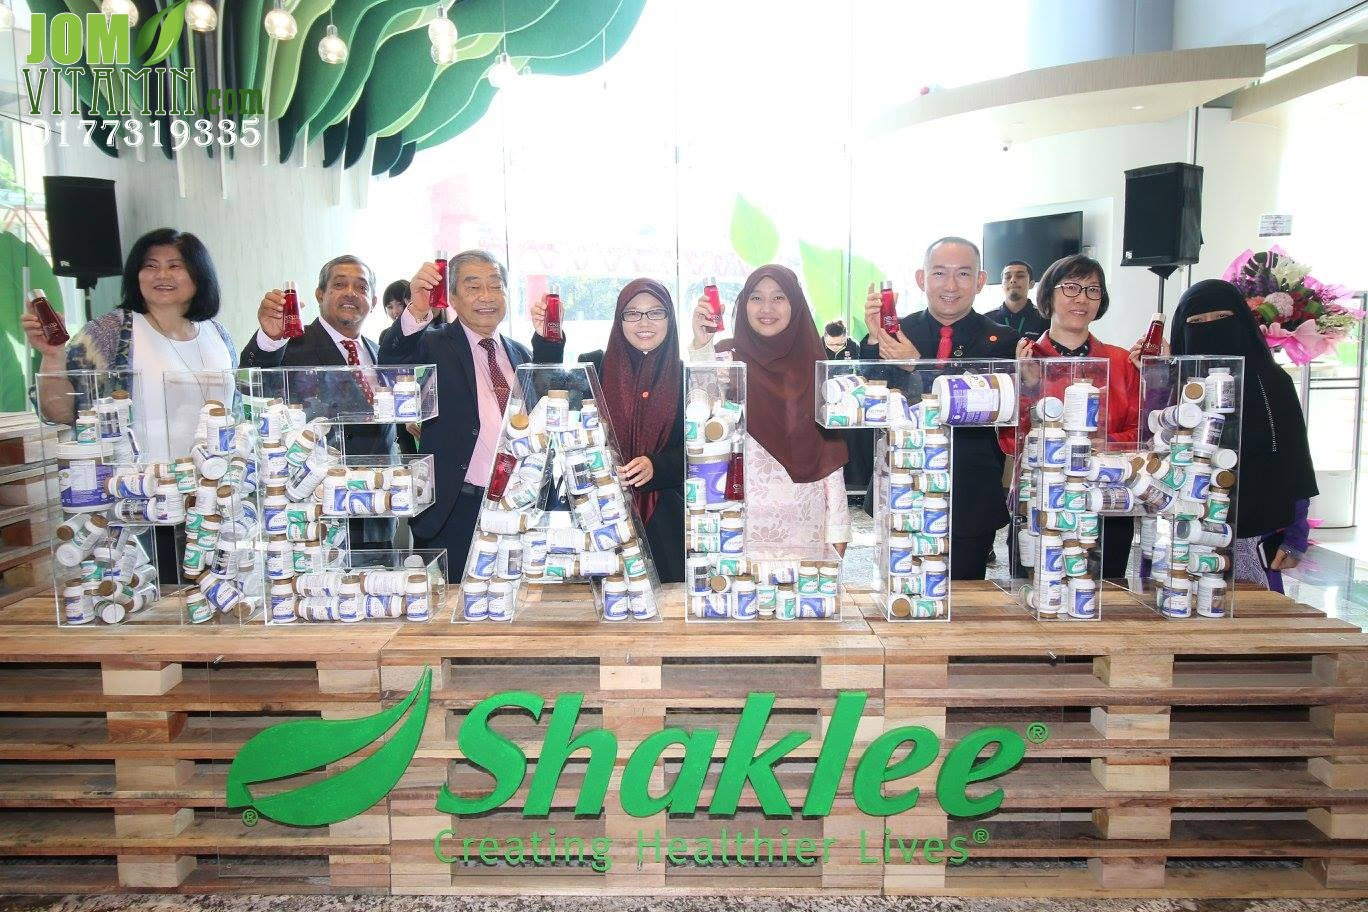 shaklee convention 2017 senarai harga produk shaklee jomvitamin 0177319335